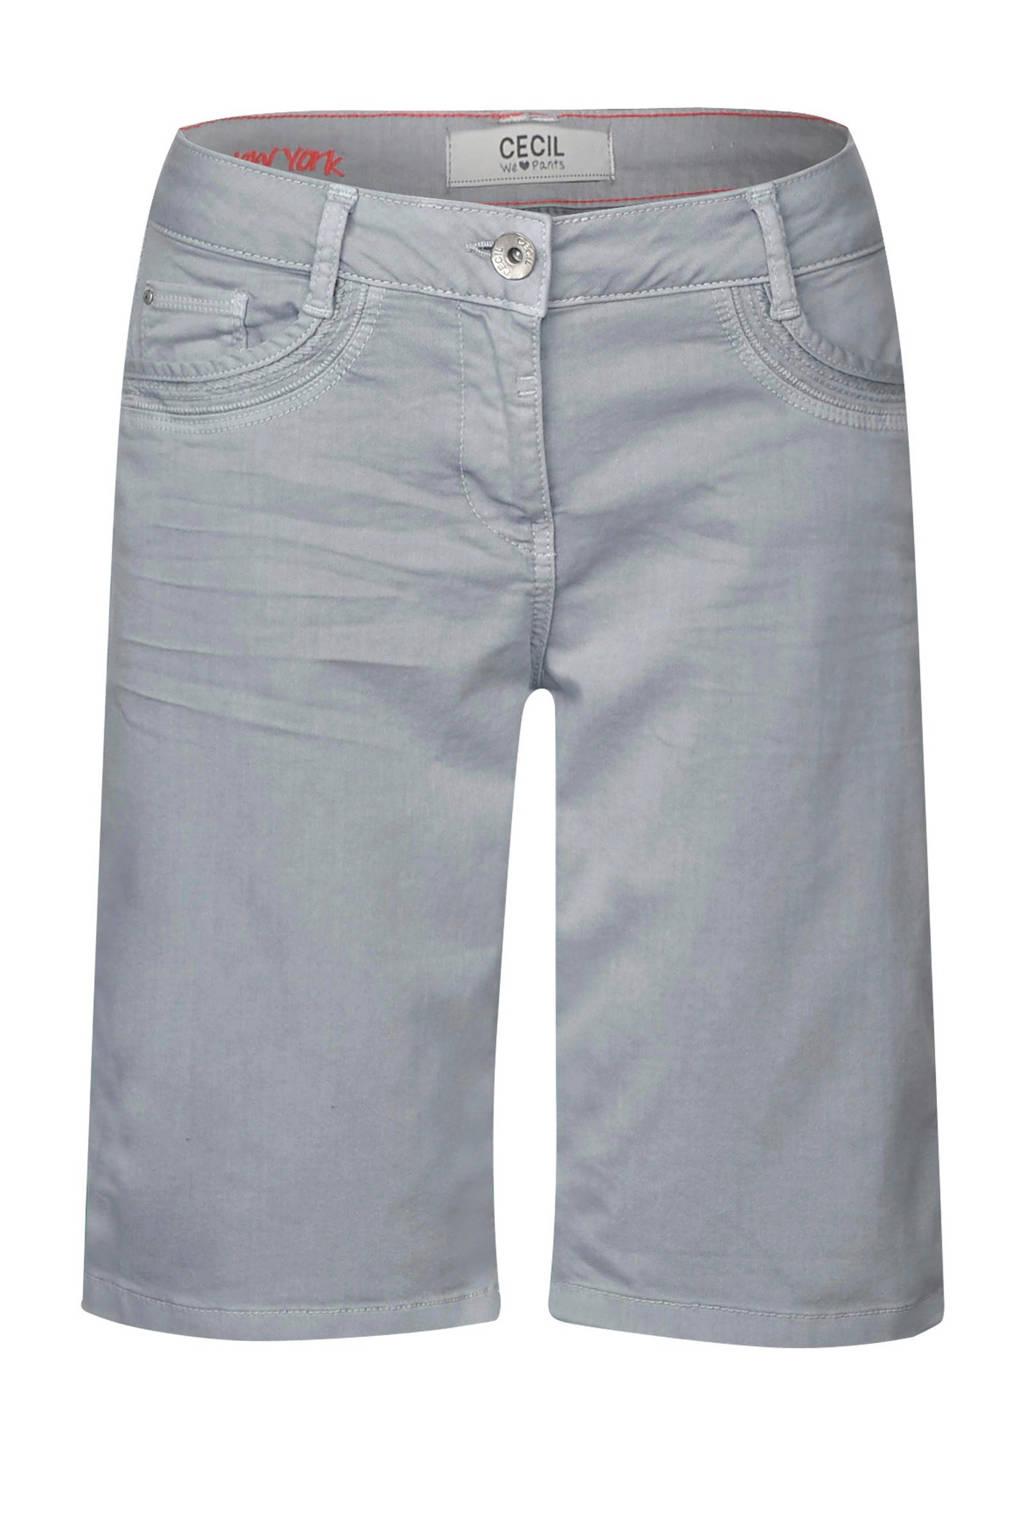 CECIL straight fit jeans short, Grijs